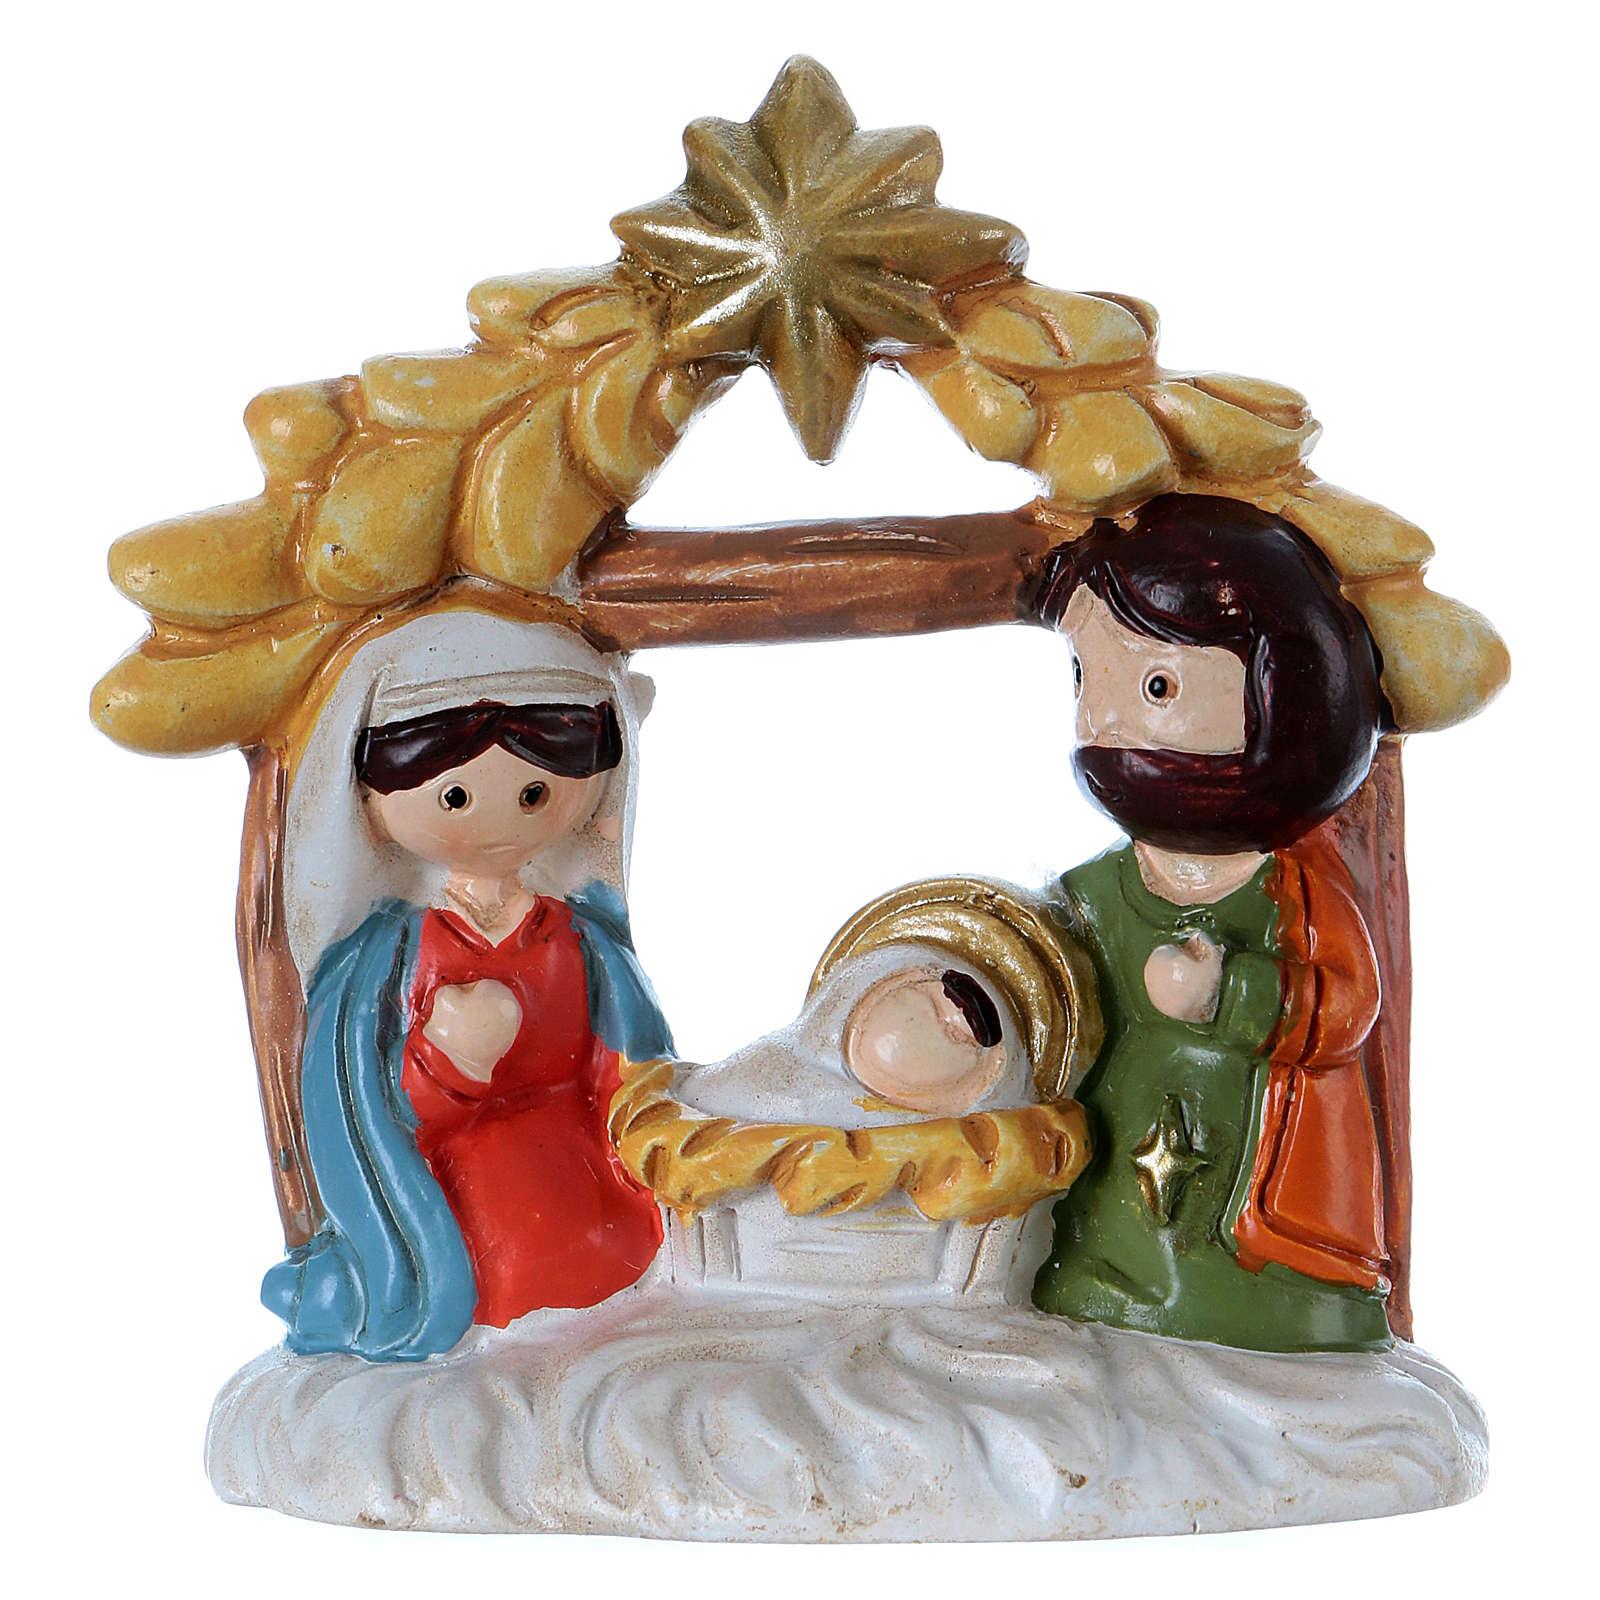 Sacra Famiglia in resina con capanna 5 cm 3